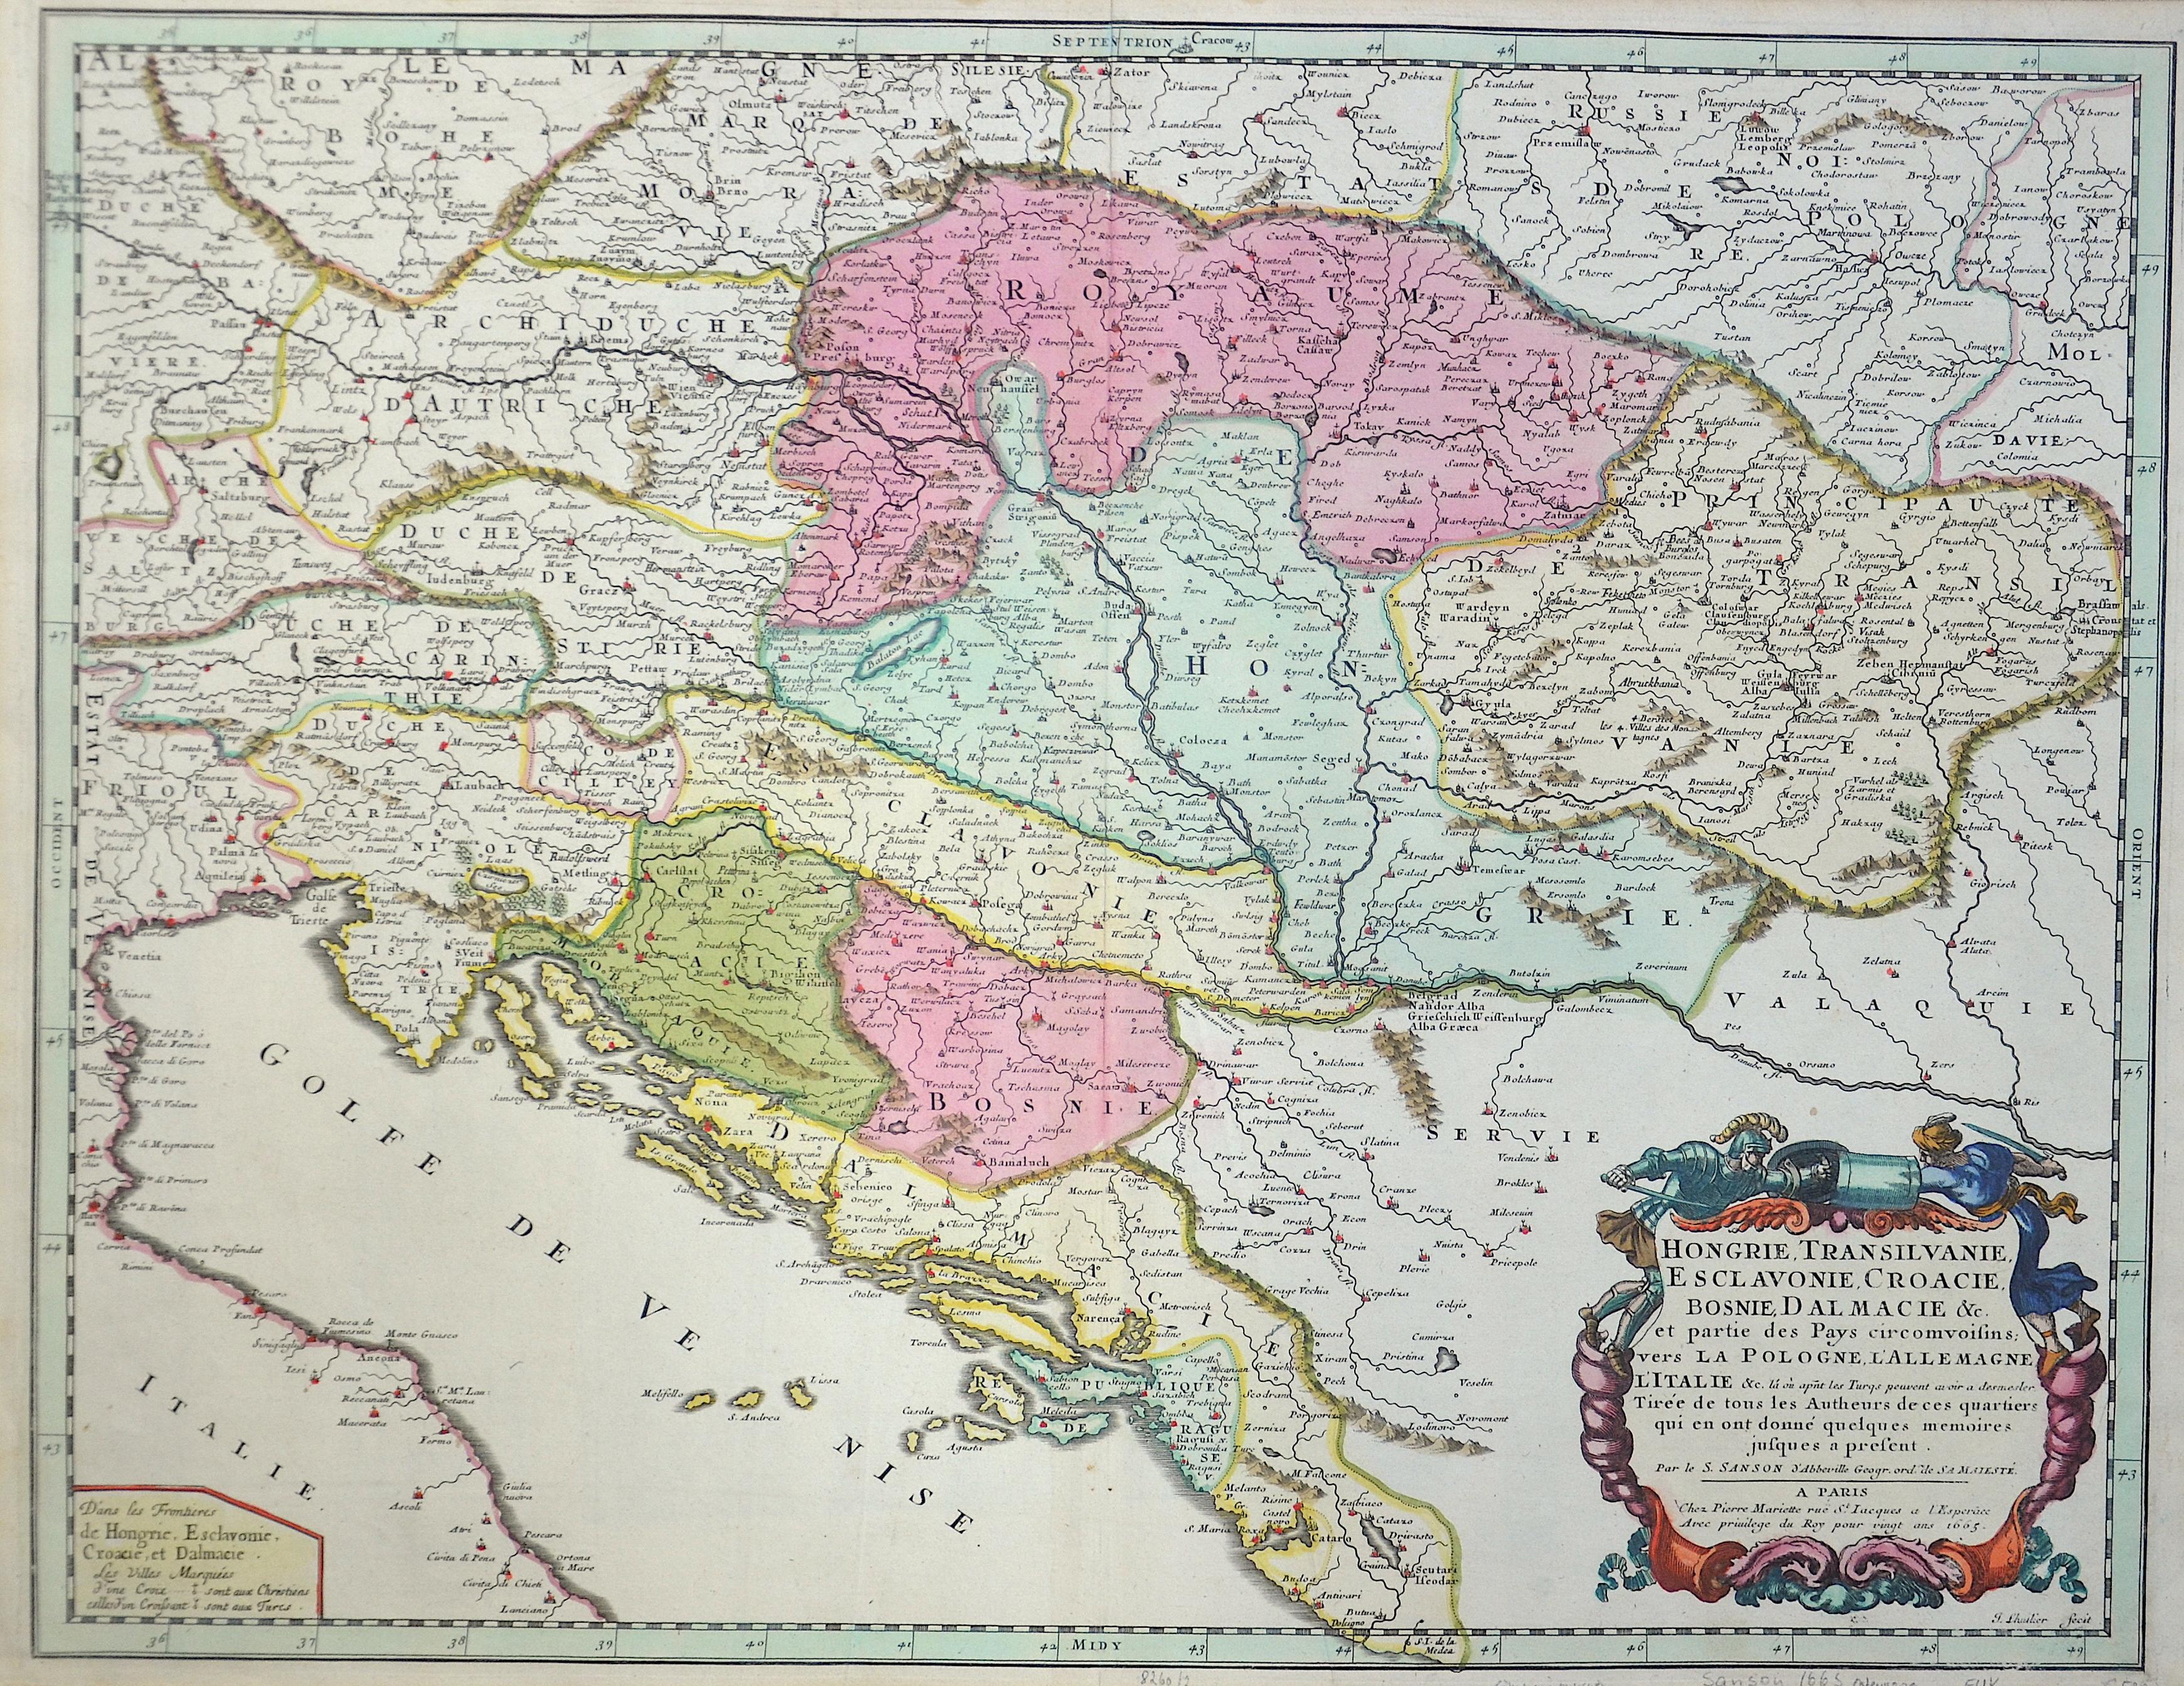 Sanson  Hongrie, Transilvanie, Esclavonie, Croacie, Bosnie,  Dalmacie ..